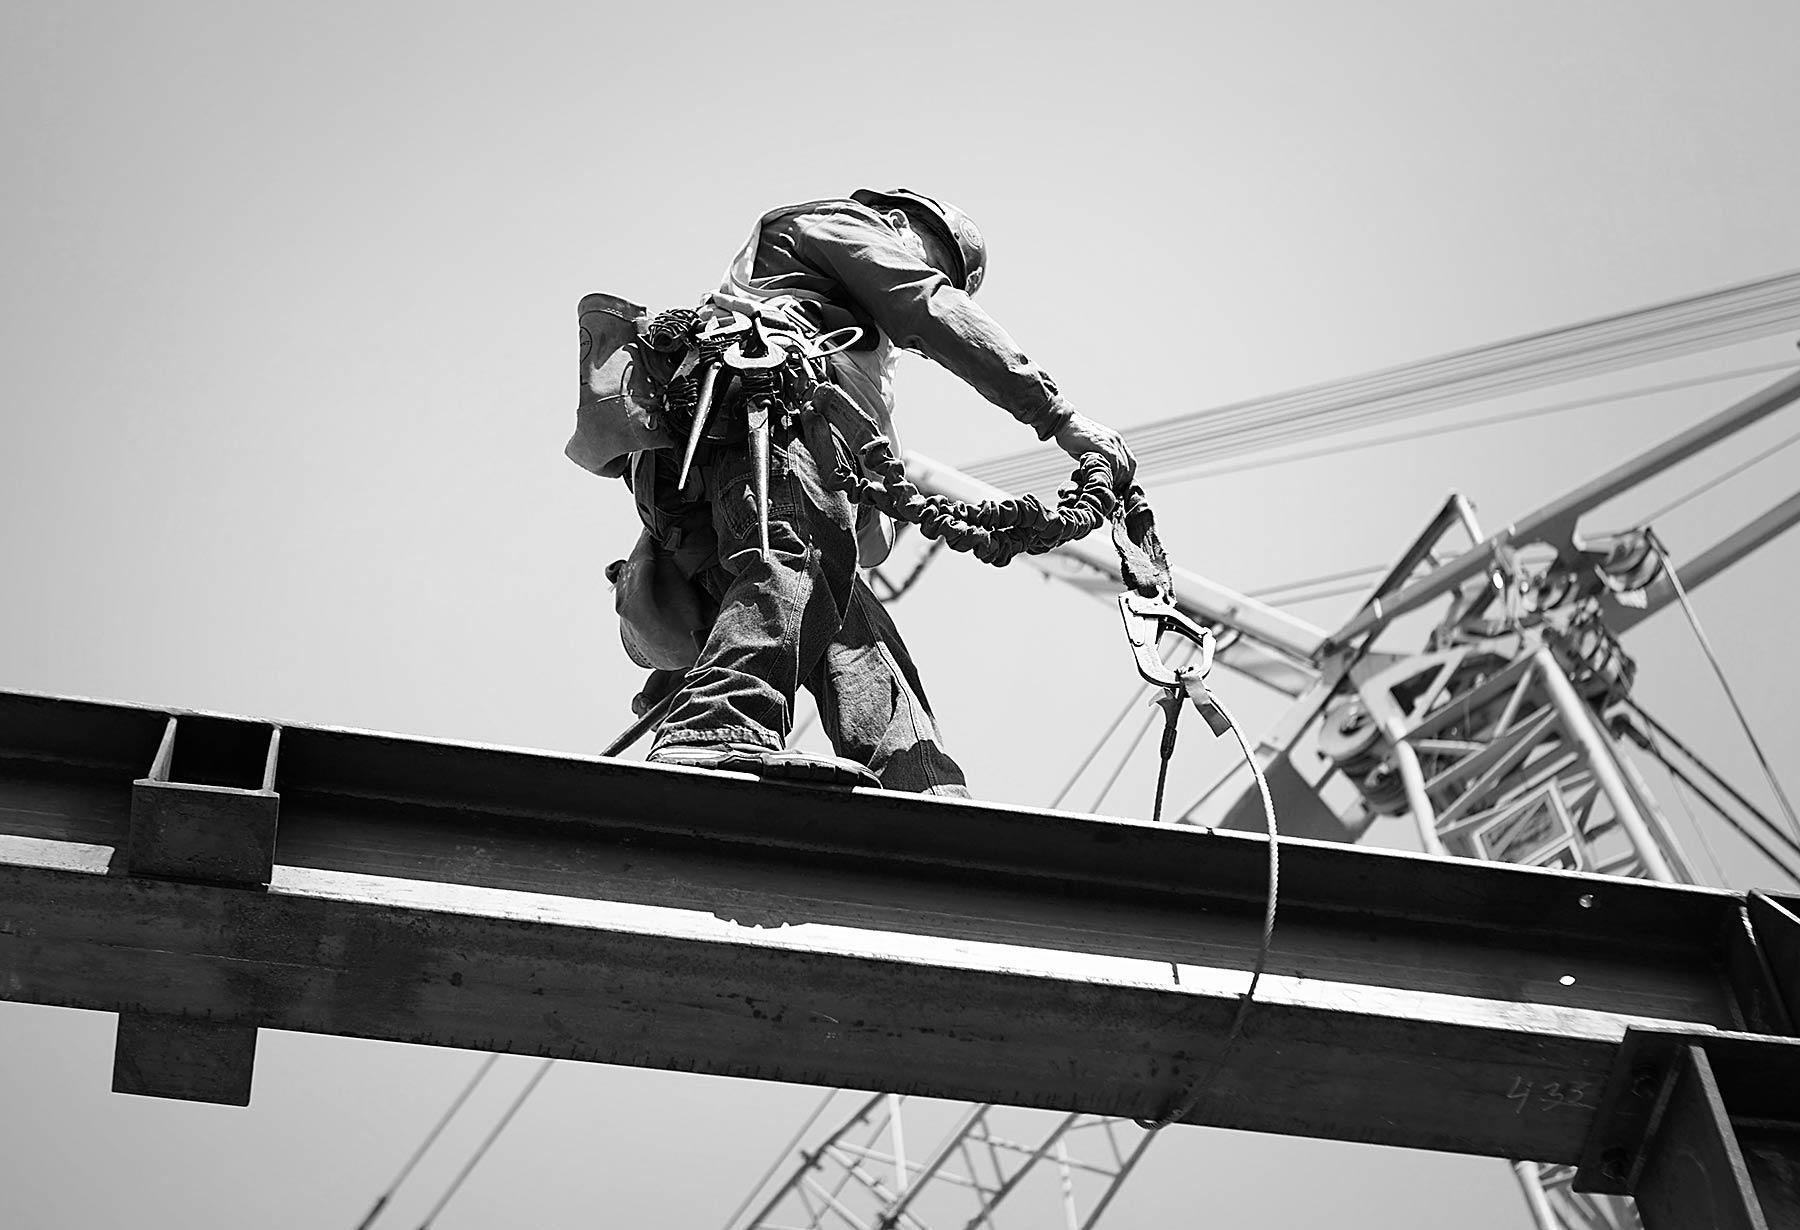 High above Salt Lake city on a construction site.